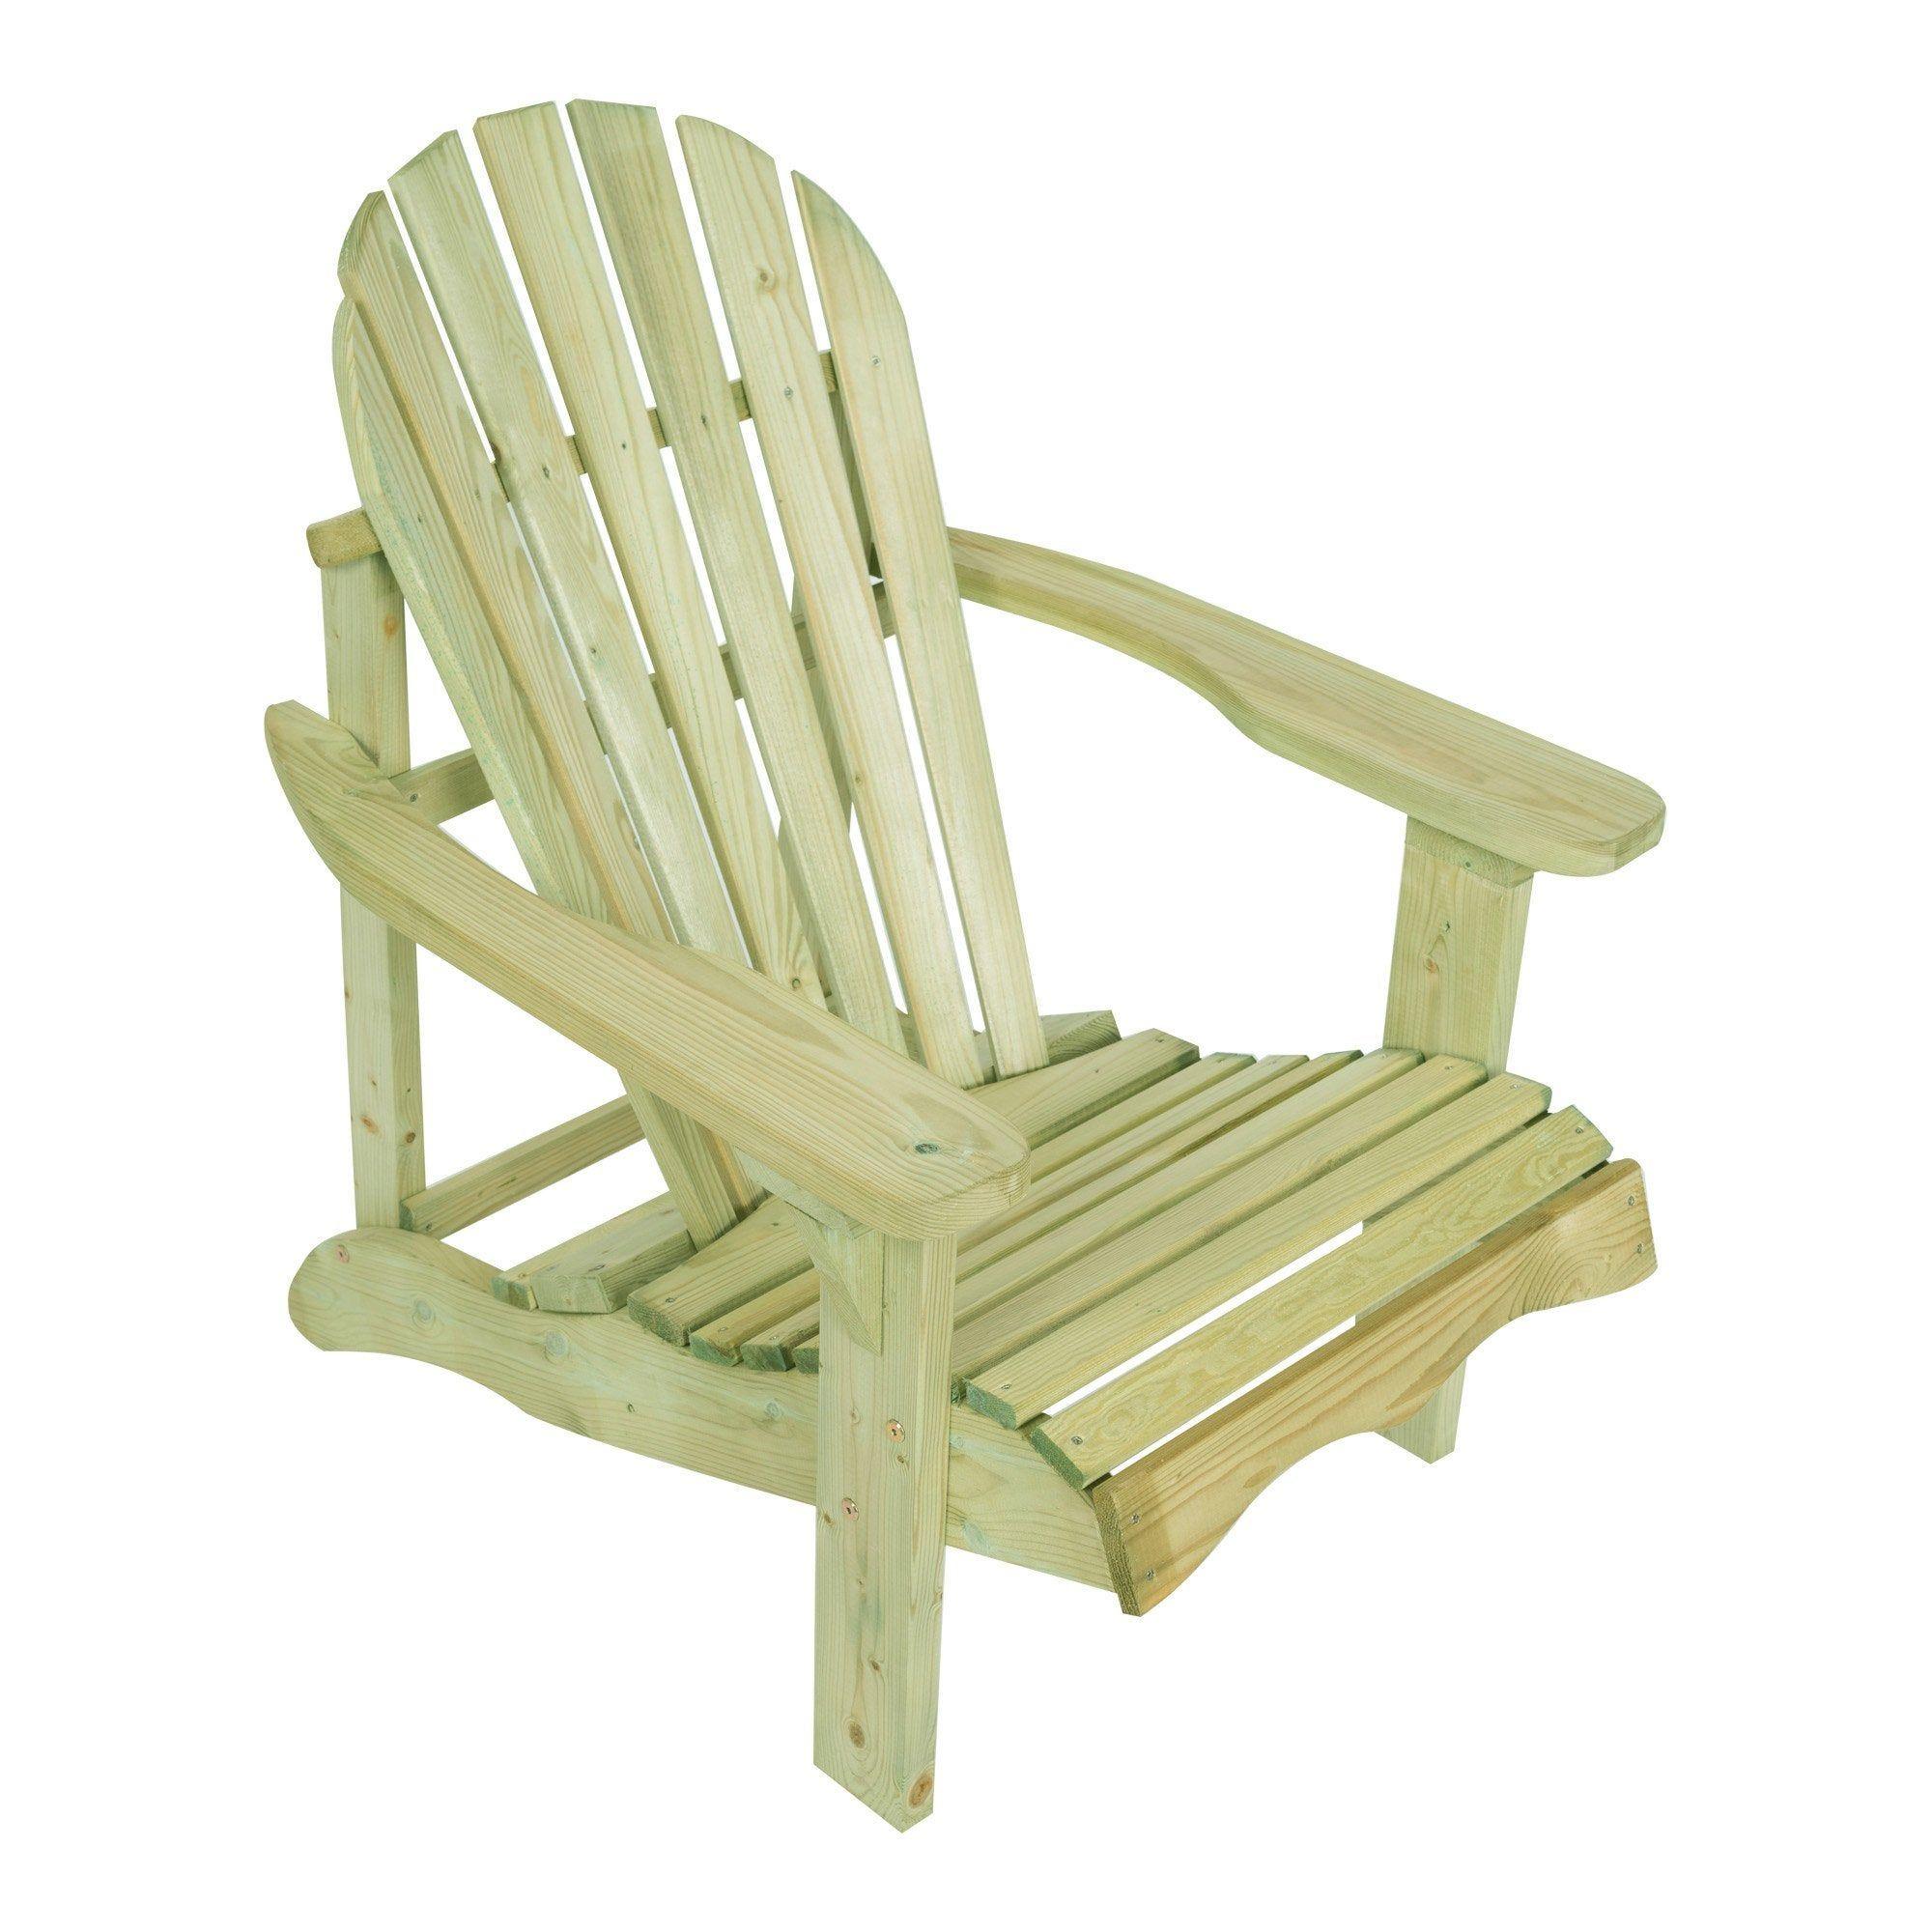 Fauteuil De Jardin En Bois Relax Naturel In 2020 Porch Chairs Outdoor Chairs Outdoor Decor